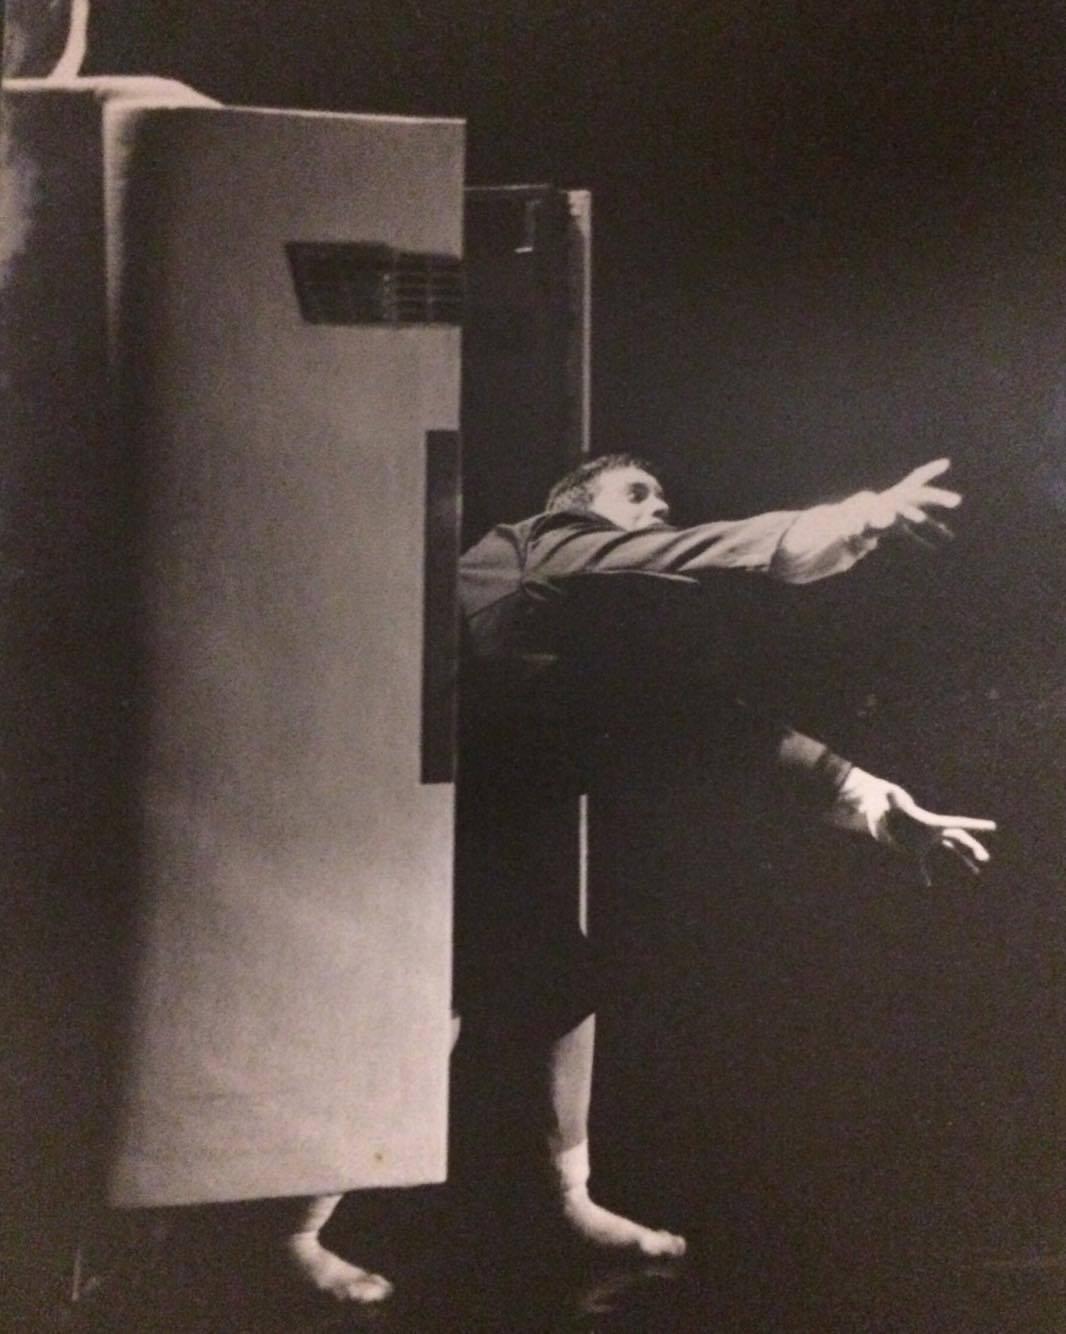 Hábitos manhãs e manias - 1995 - Coreografia Giselle Tápias